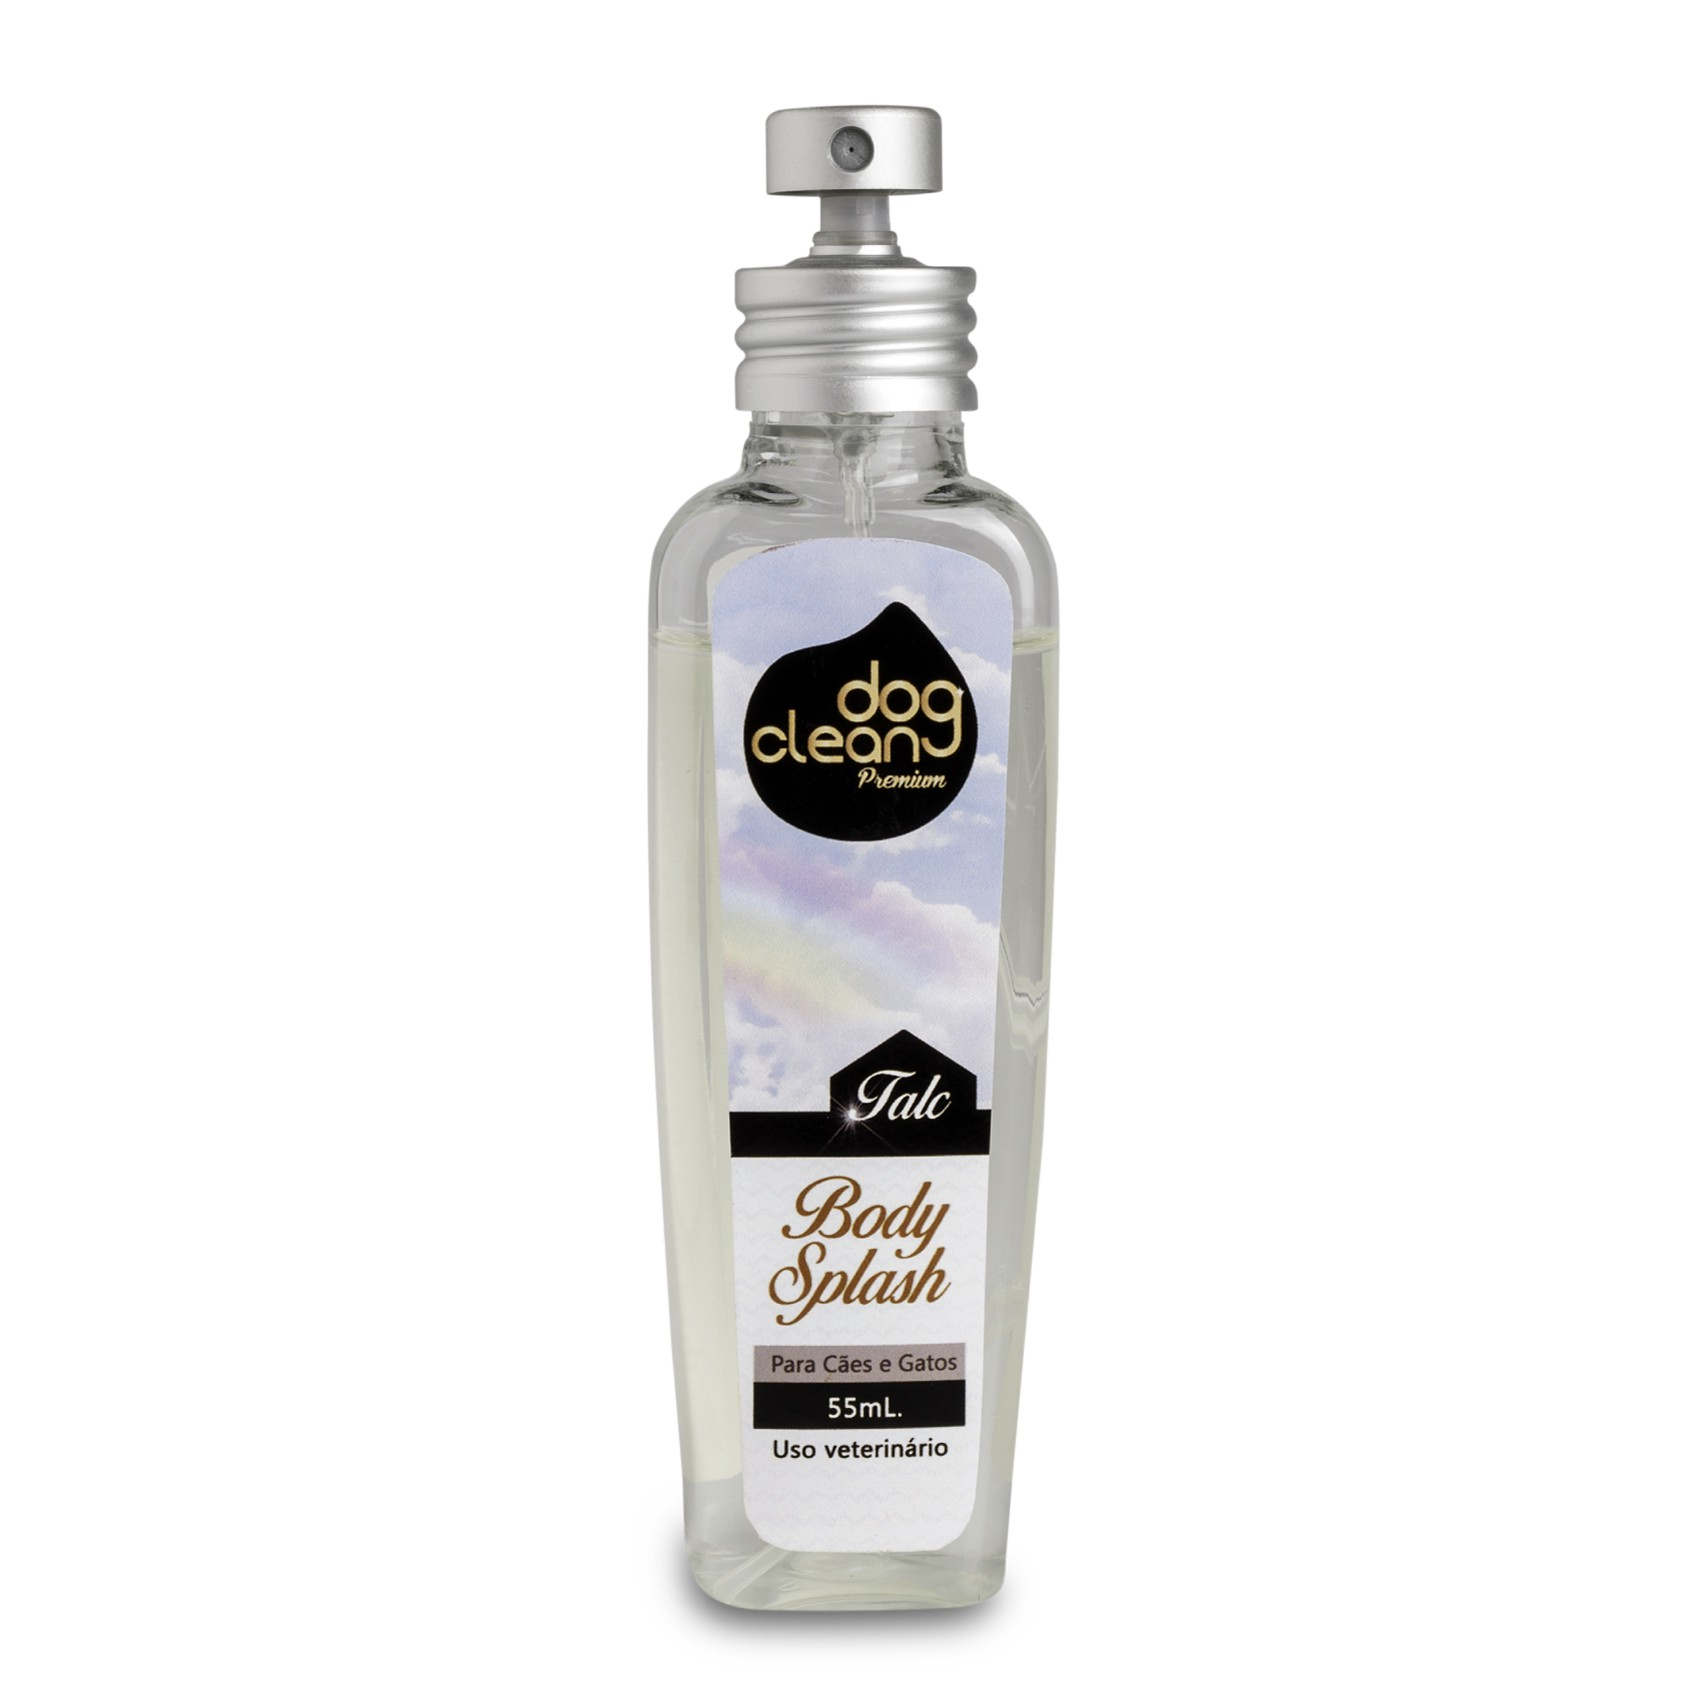 Perfume Body Splash Talc 55ml Dog Clean